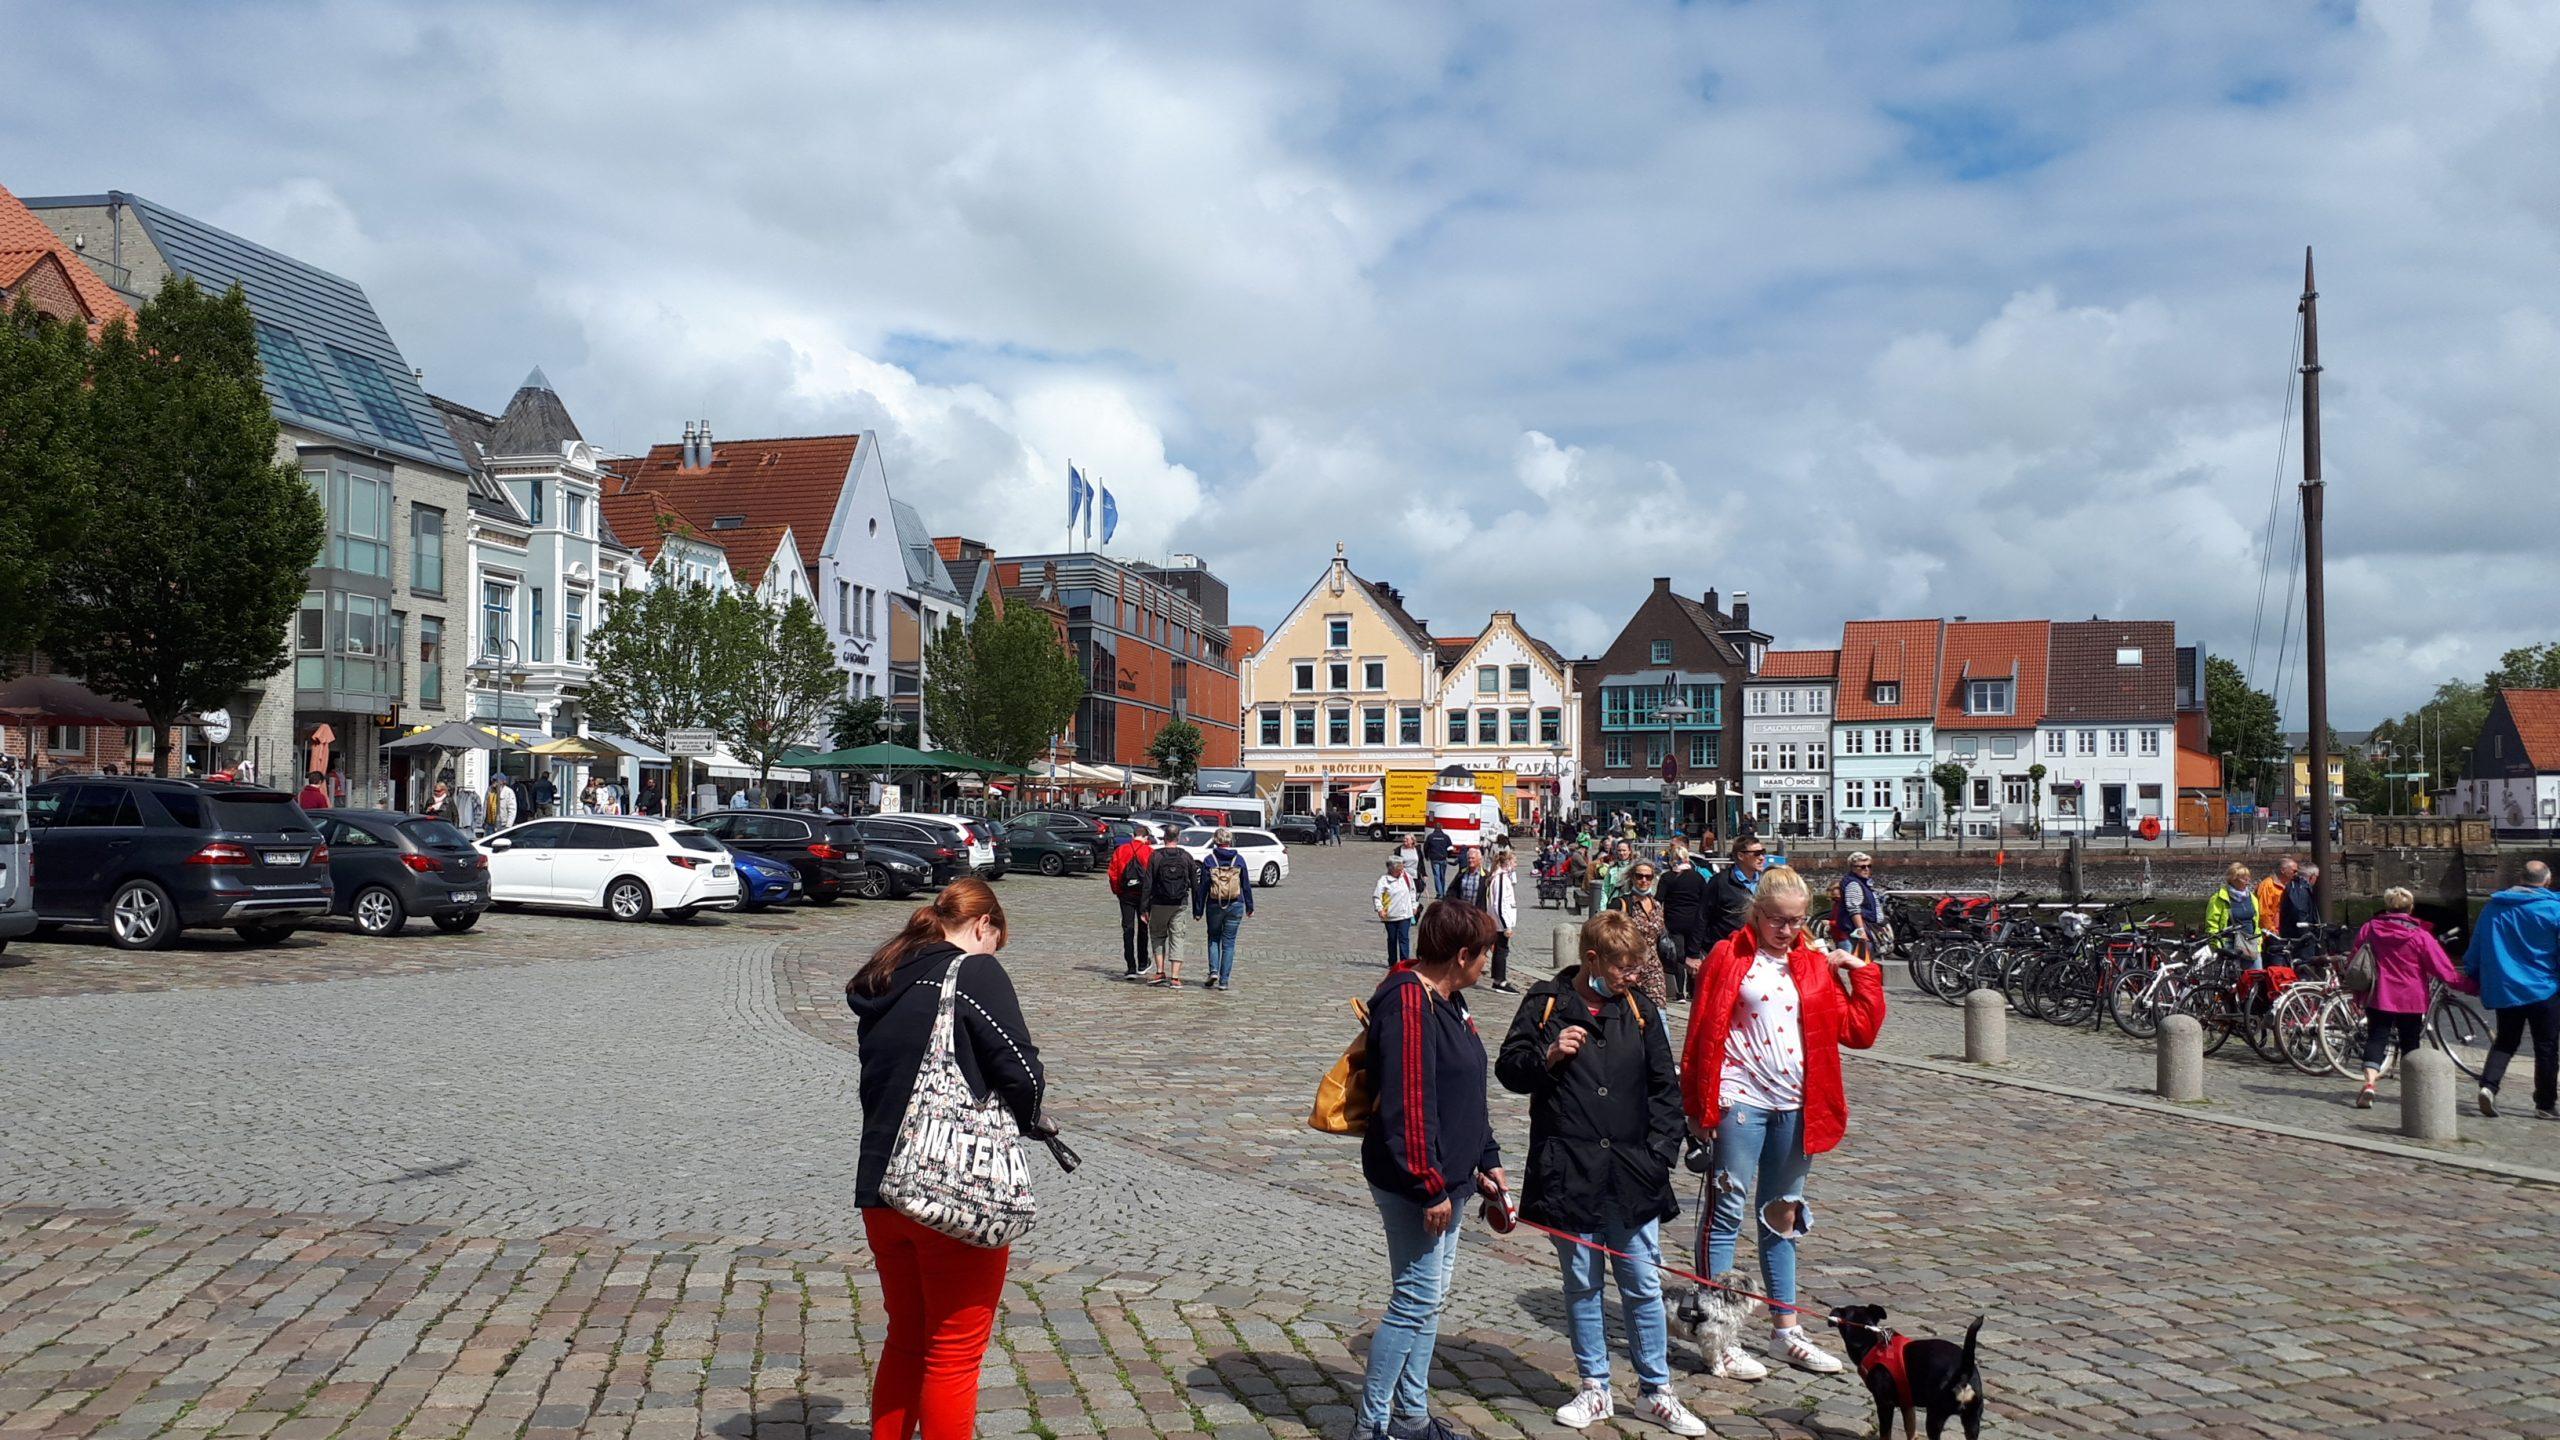 Den nordligste tyske delstat, Slesvig-Holsten, er stadig åben for danske turister. Her er det fra byen Husum i Slesvig-Holsten, foto: Henrik Baumgarten.